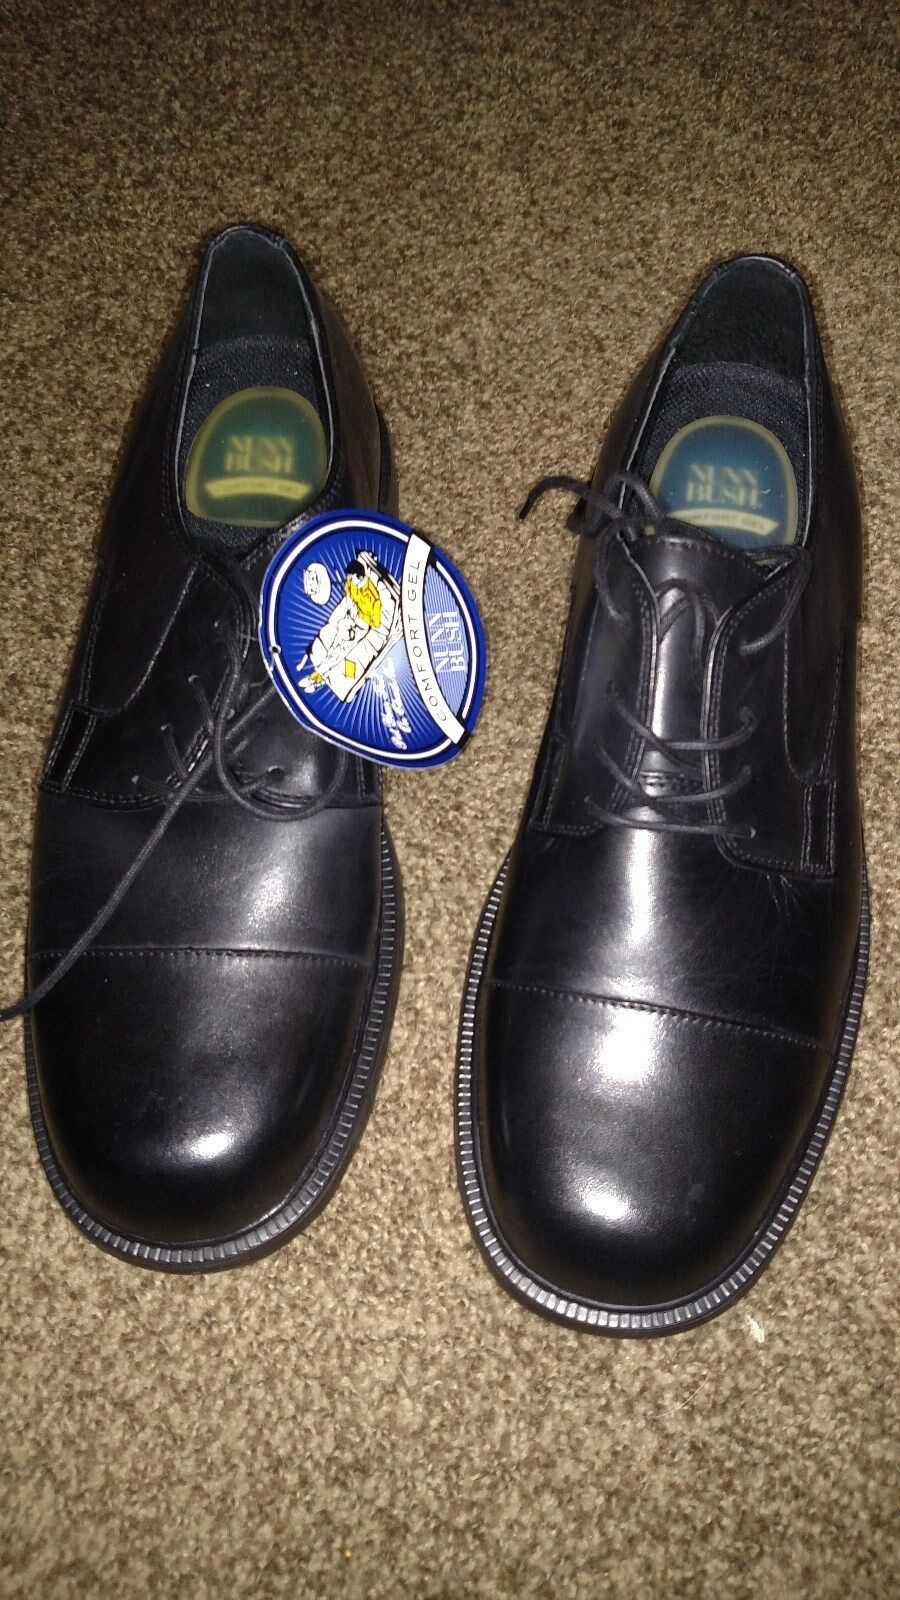 Nunn Bush mens black resistant shoes 12 Hanlan slip resistant black dde050